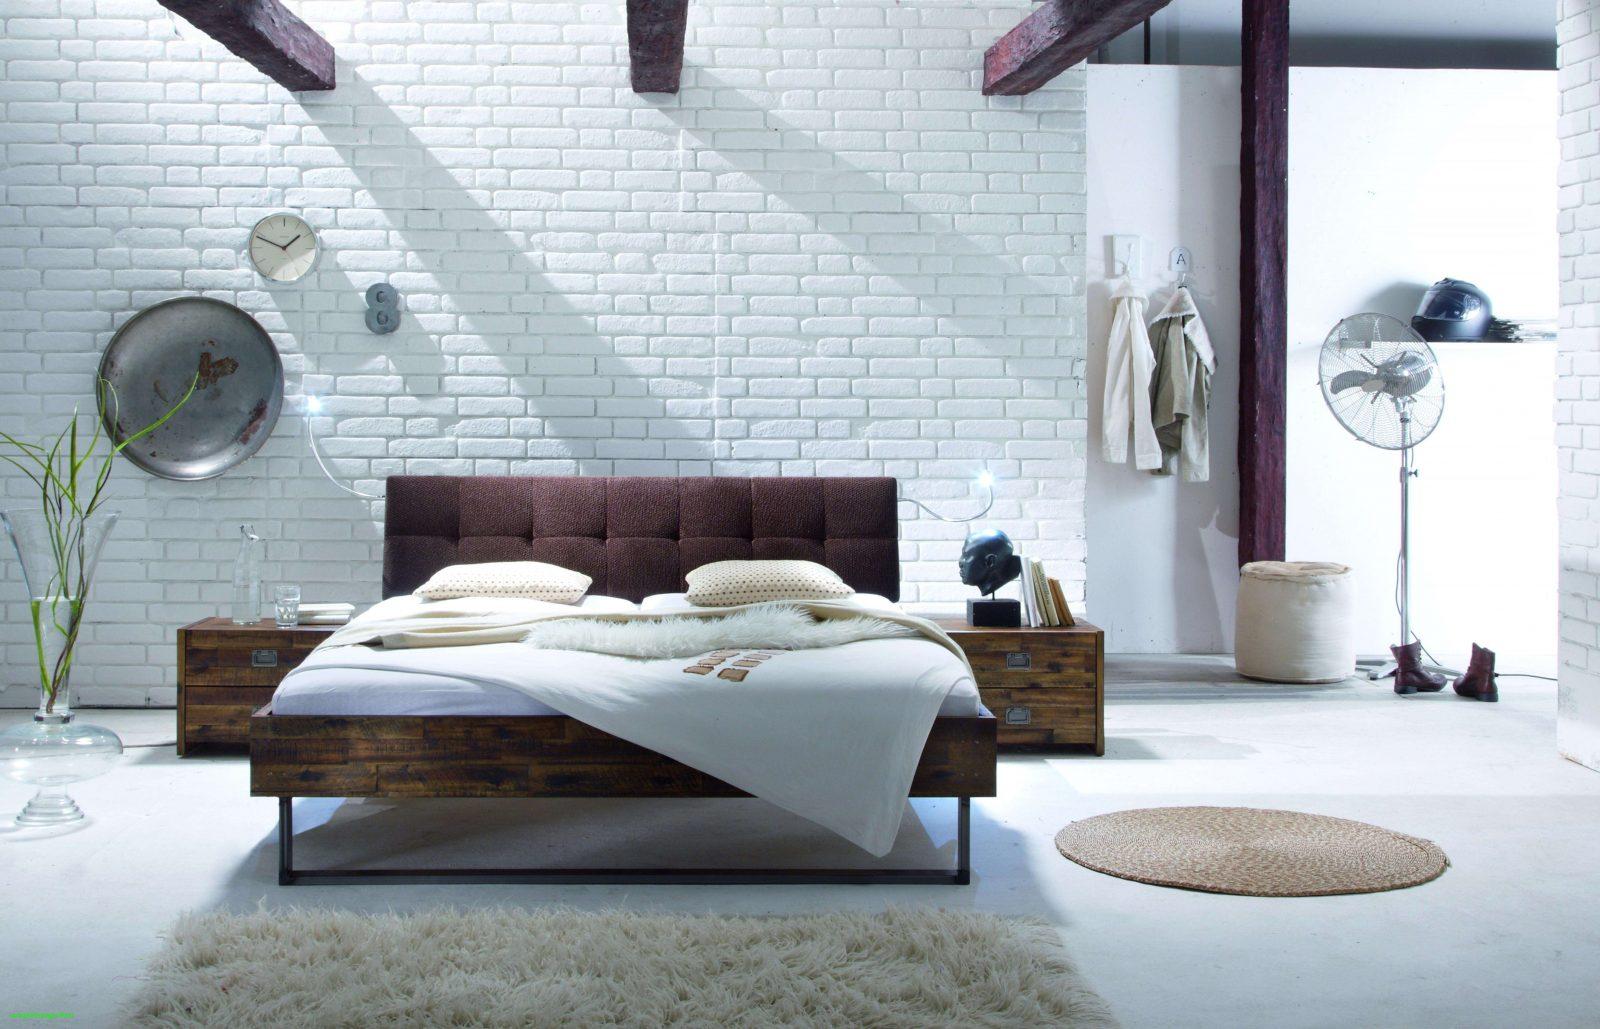 Vintage Bett Inspirierend Wohnideen Bett Selber Bauen Kreativ Mit von Bett Selber Bauen Kreativ Bild